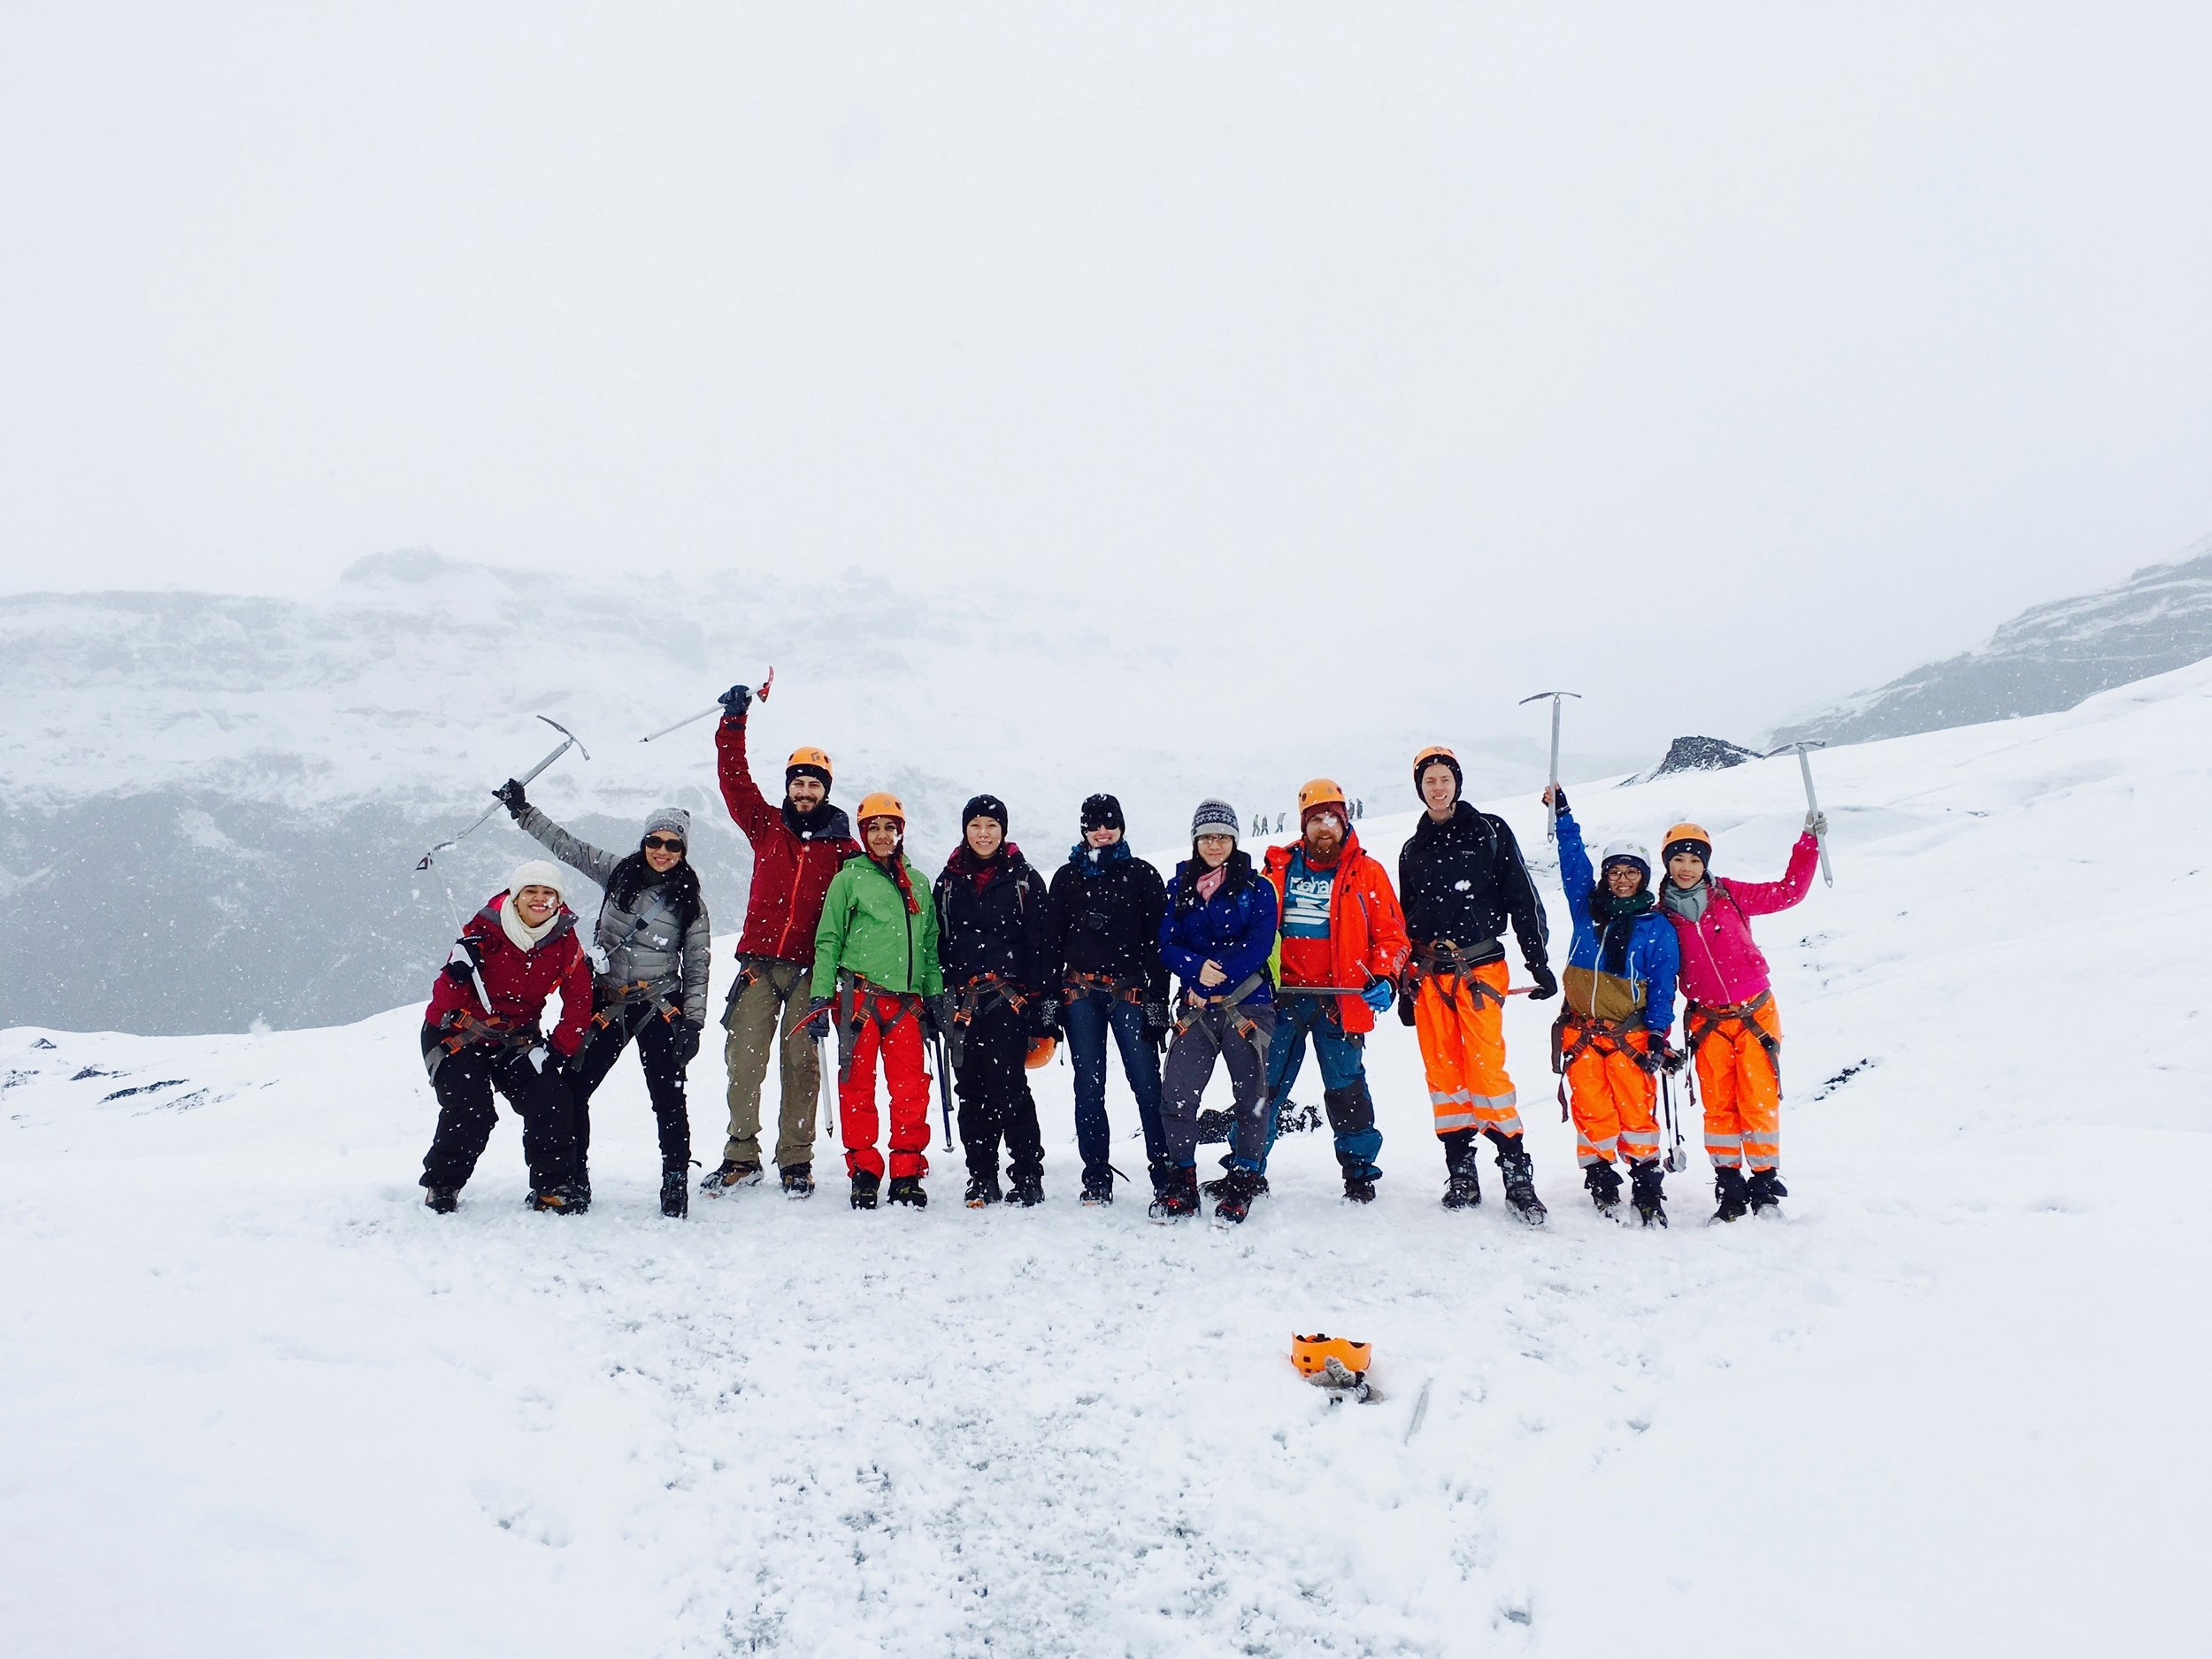 adventure-climbers-cold-671912.jpg